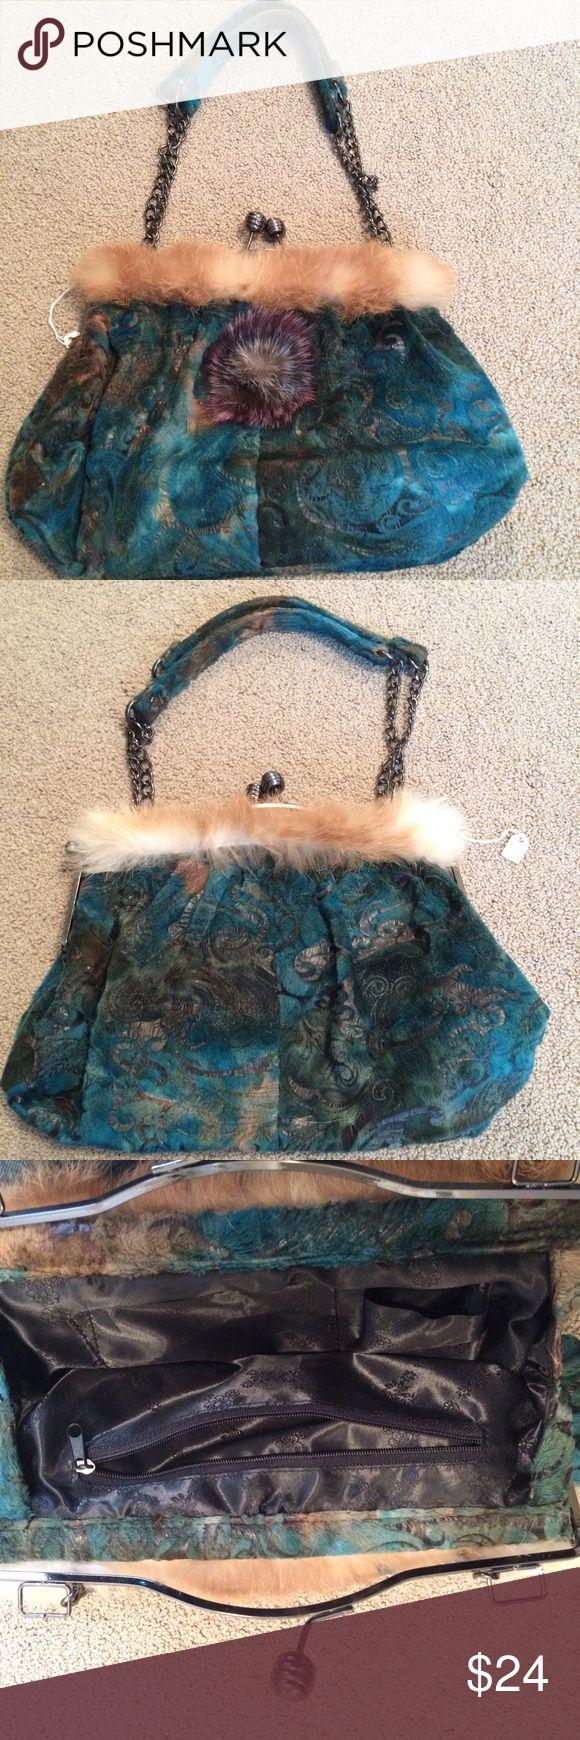 Vintage design handbag Fun, colorful brand new with tag vintage look handbag. Other